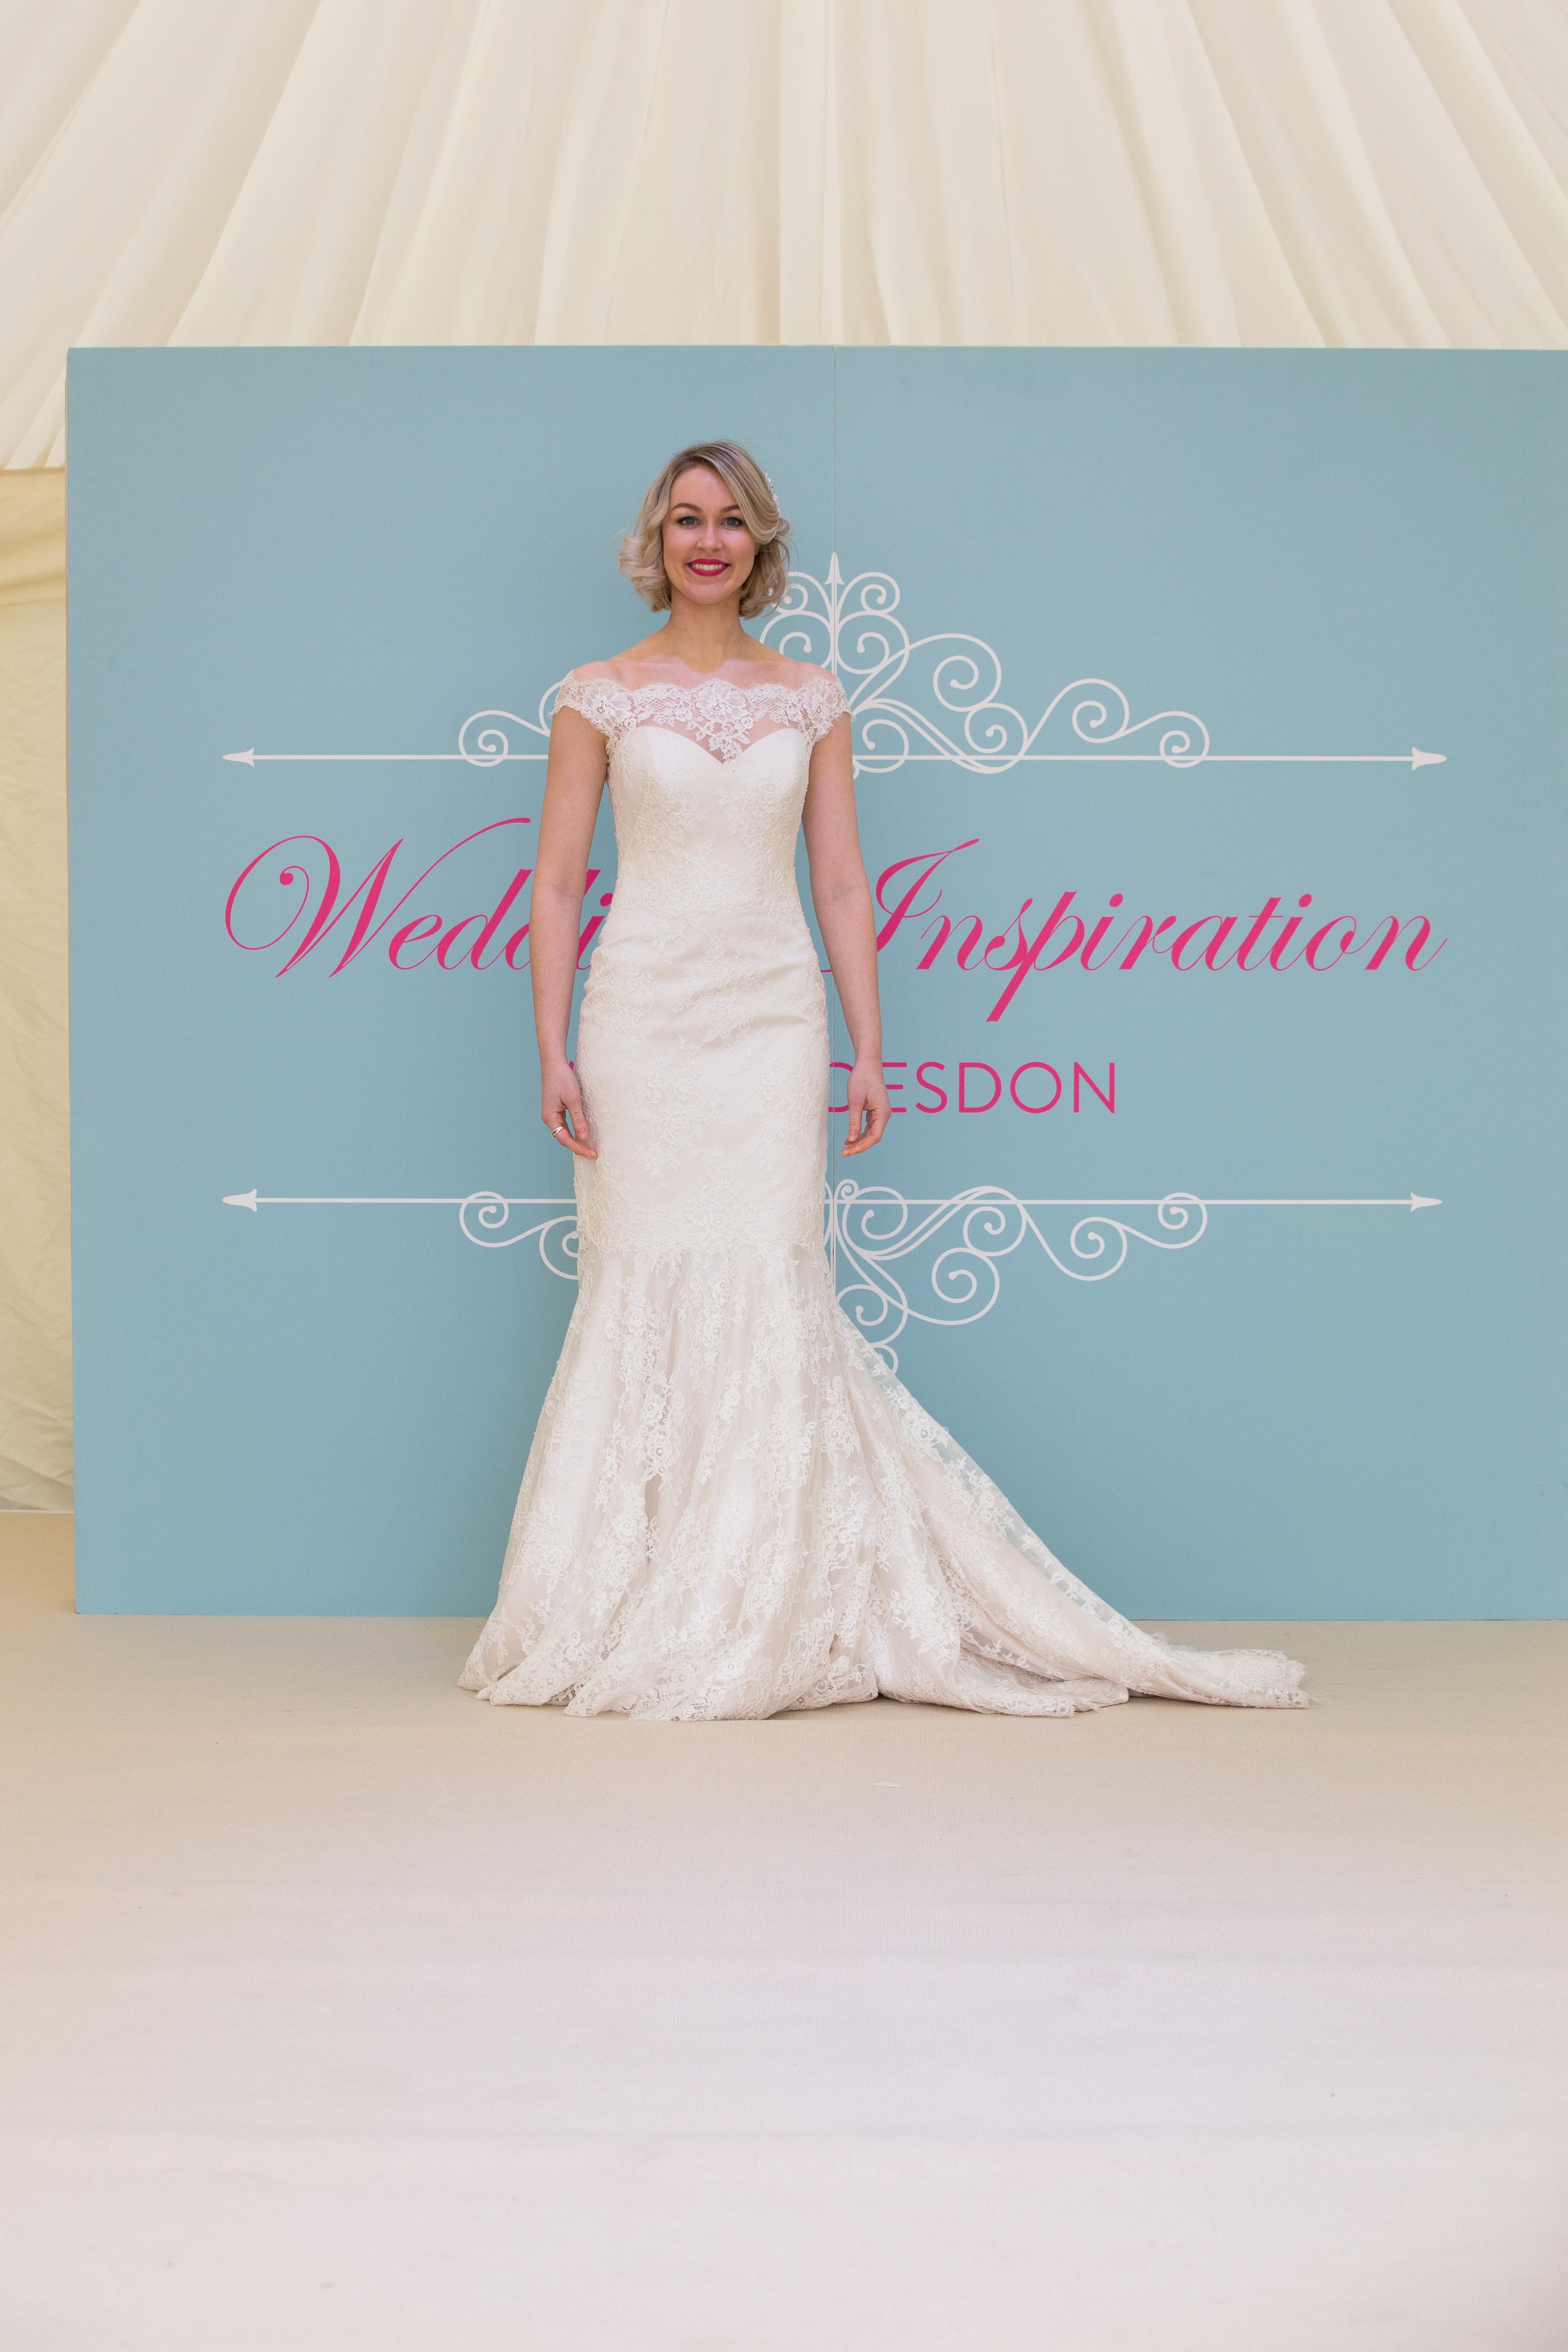 Wedding Inspiration at Waddesdon - Ellie Sanderson